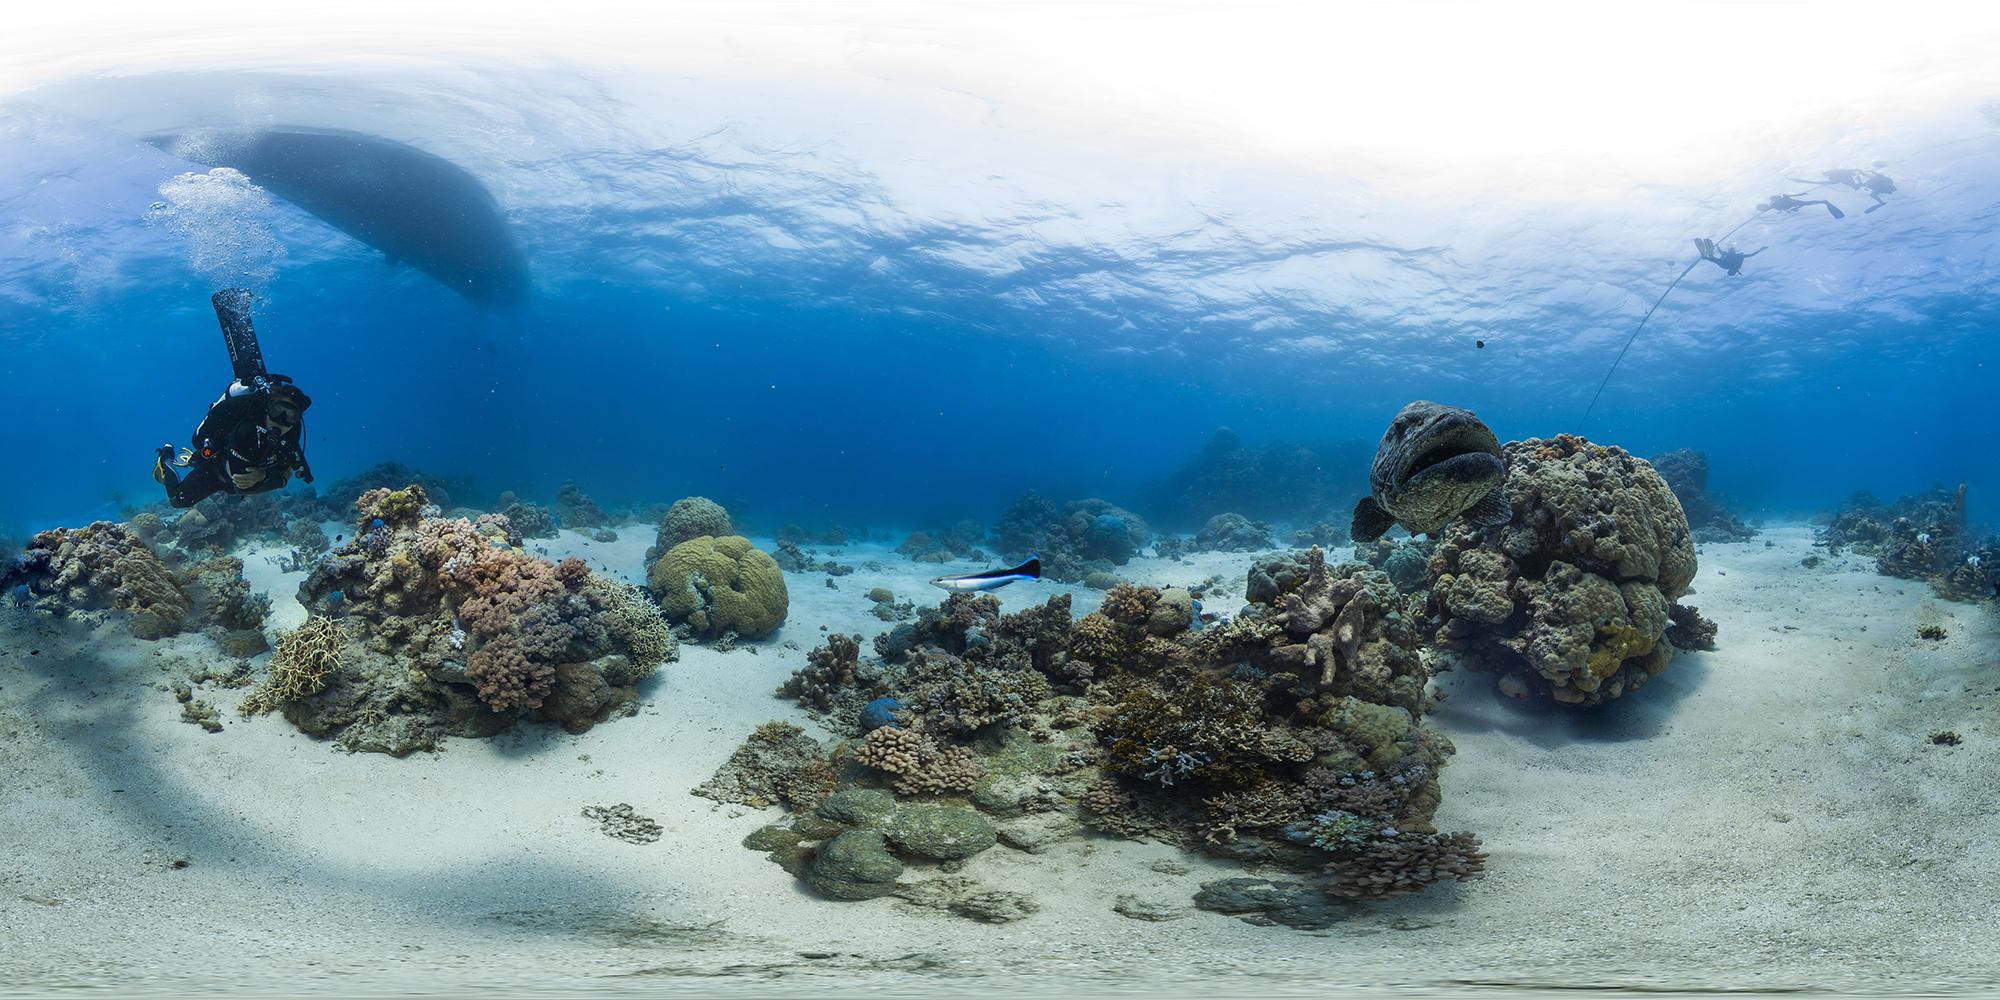 cod hole, GREAT BARRIER REEF CREDIT: THE OCEAN AGENCY / XL CATLIN SEAVIEW SURVEY